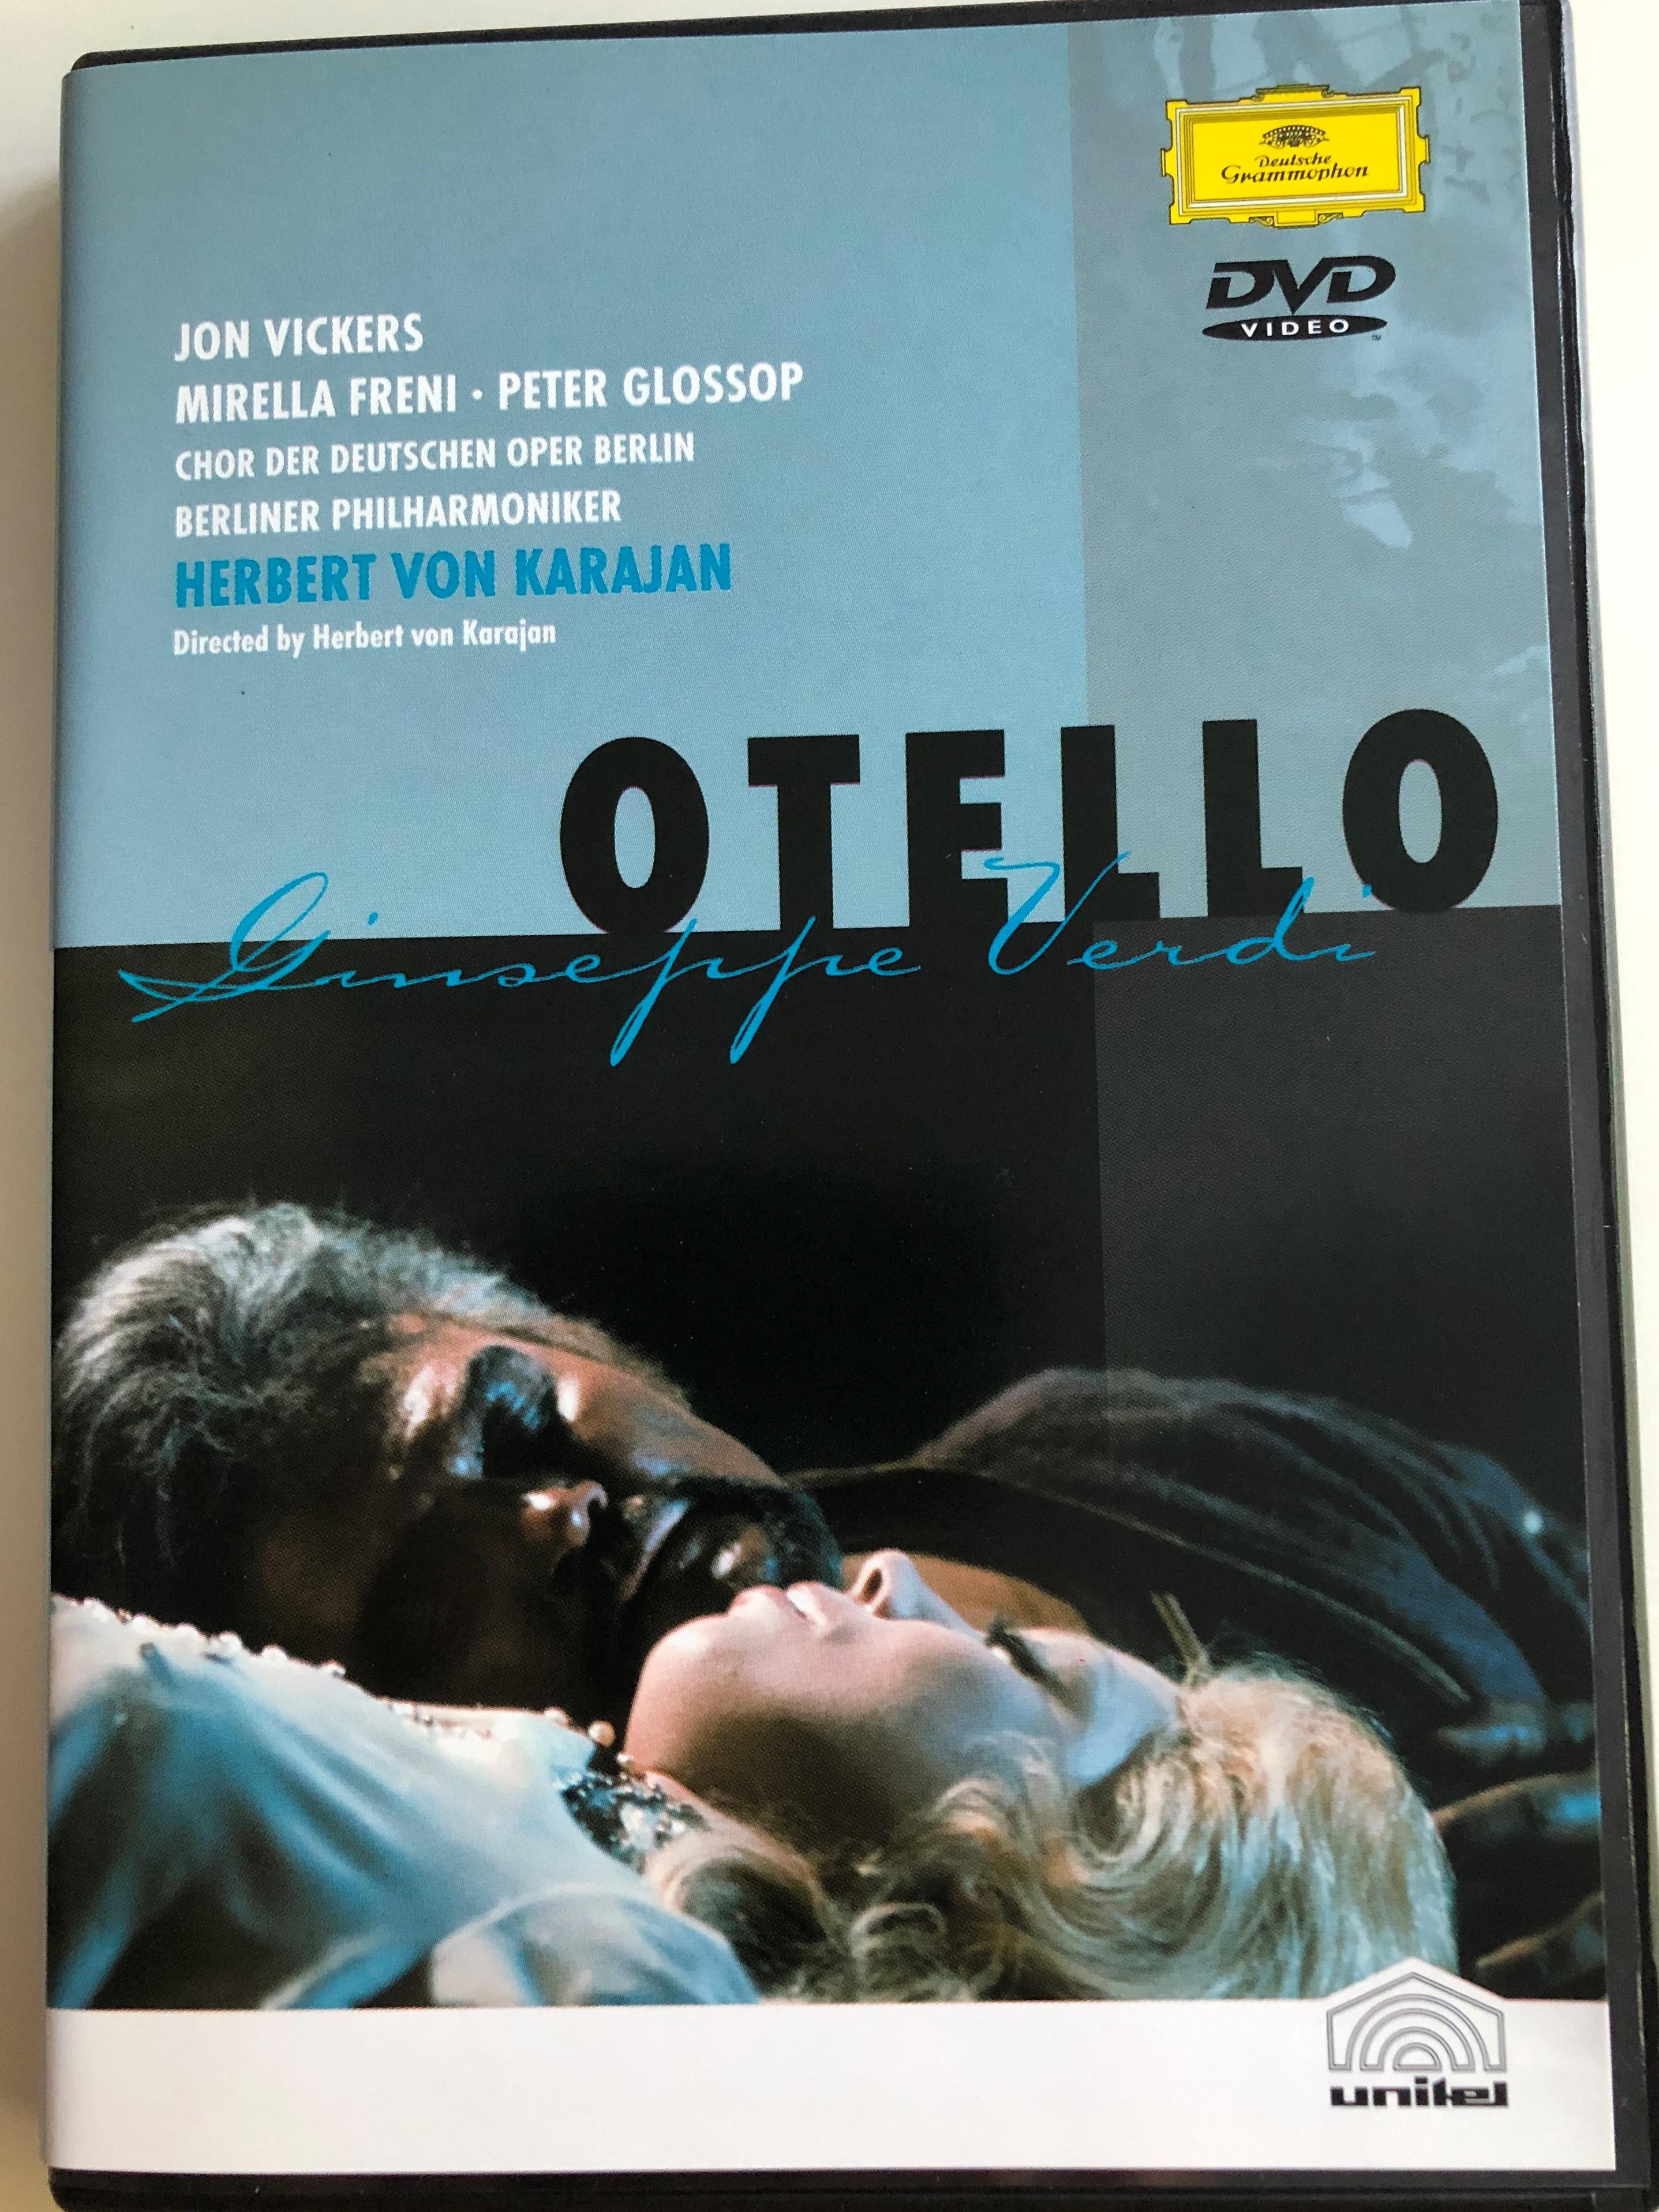 giuseppe-verdi-otello-dvd-2001-jon-vickers-mirella-freni-peter-glossop-berliner-philharmoniker-chor-der-deutschen-oper-berlin-conducted-by-herbert-von-karajan-1-.jpg